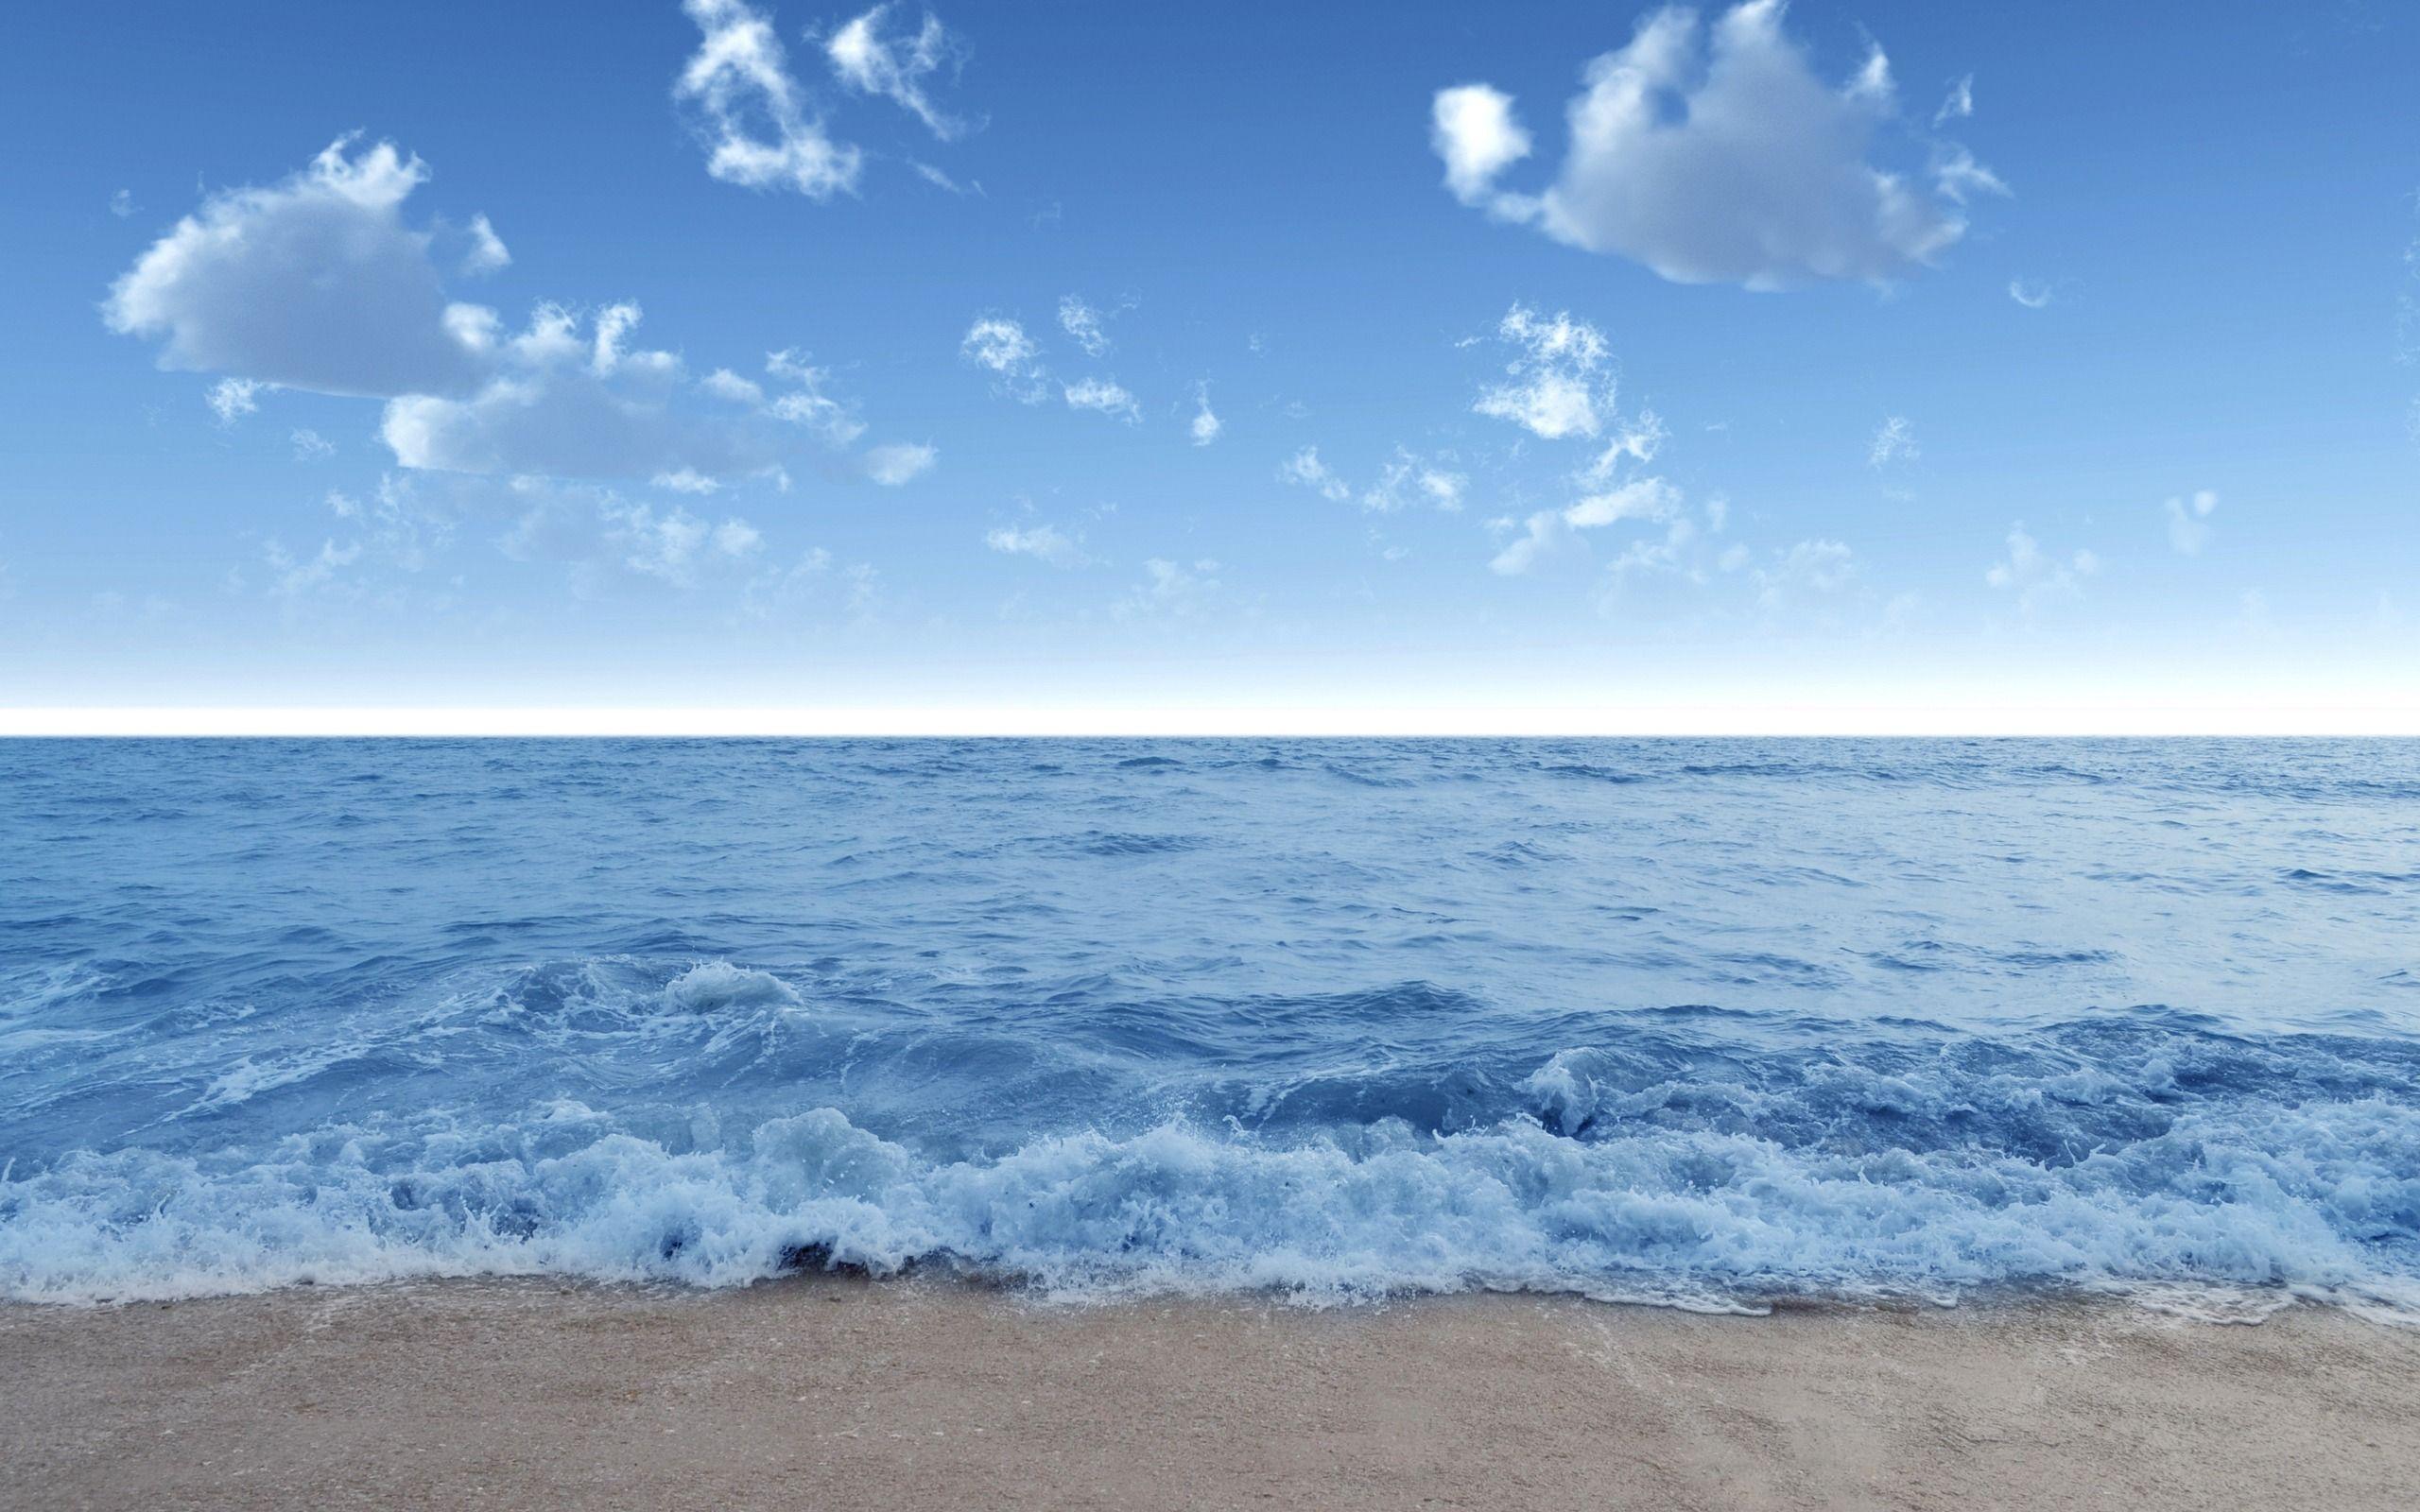 Light blue grey waves